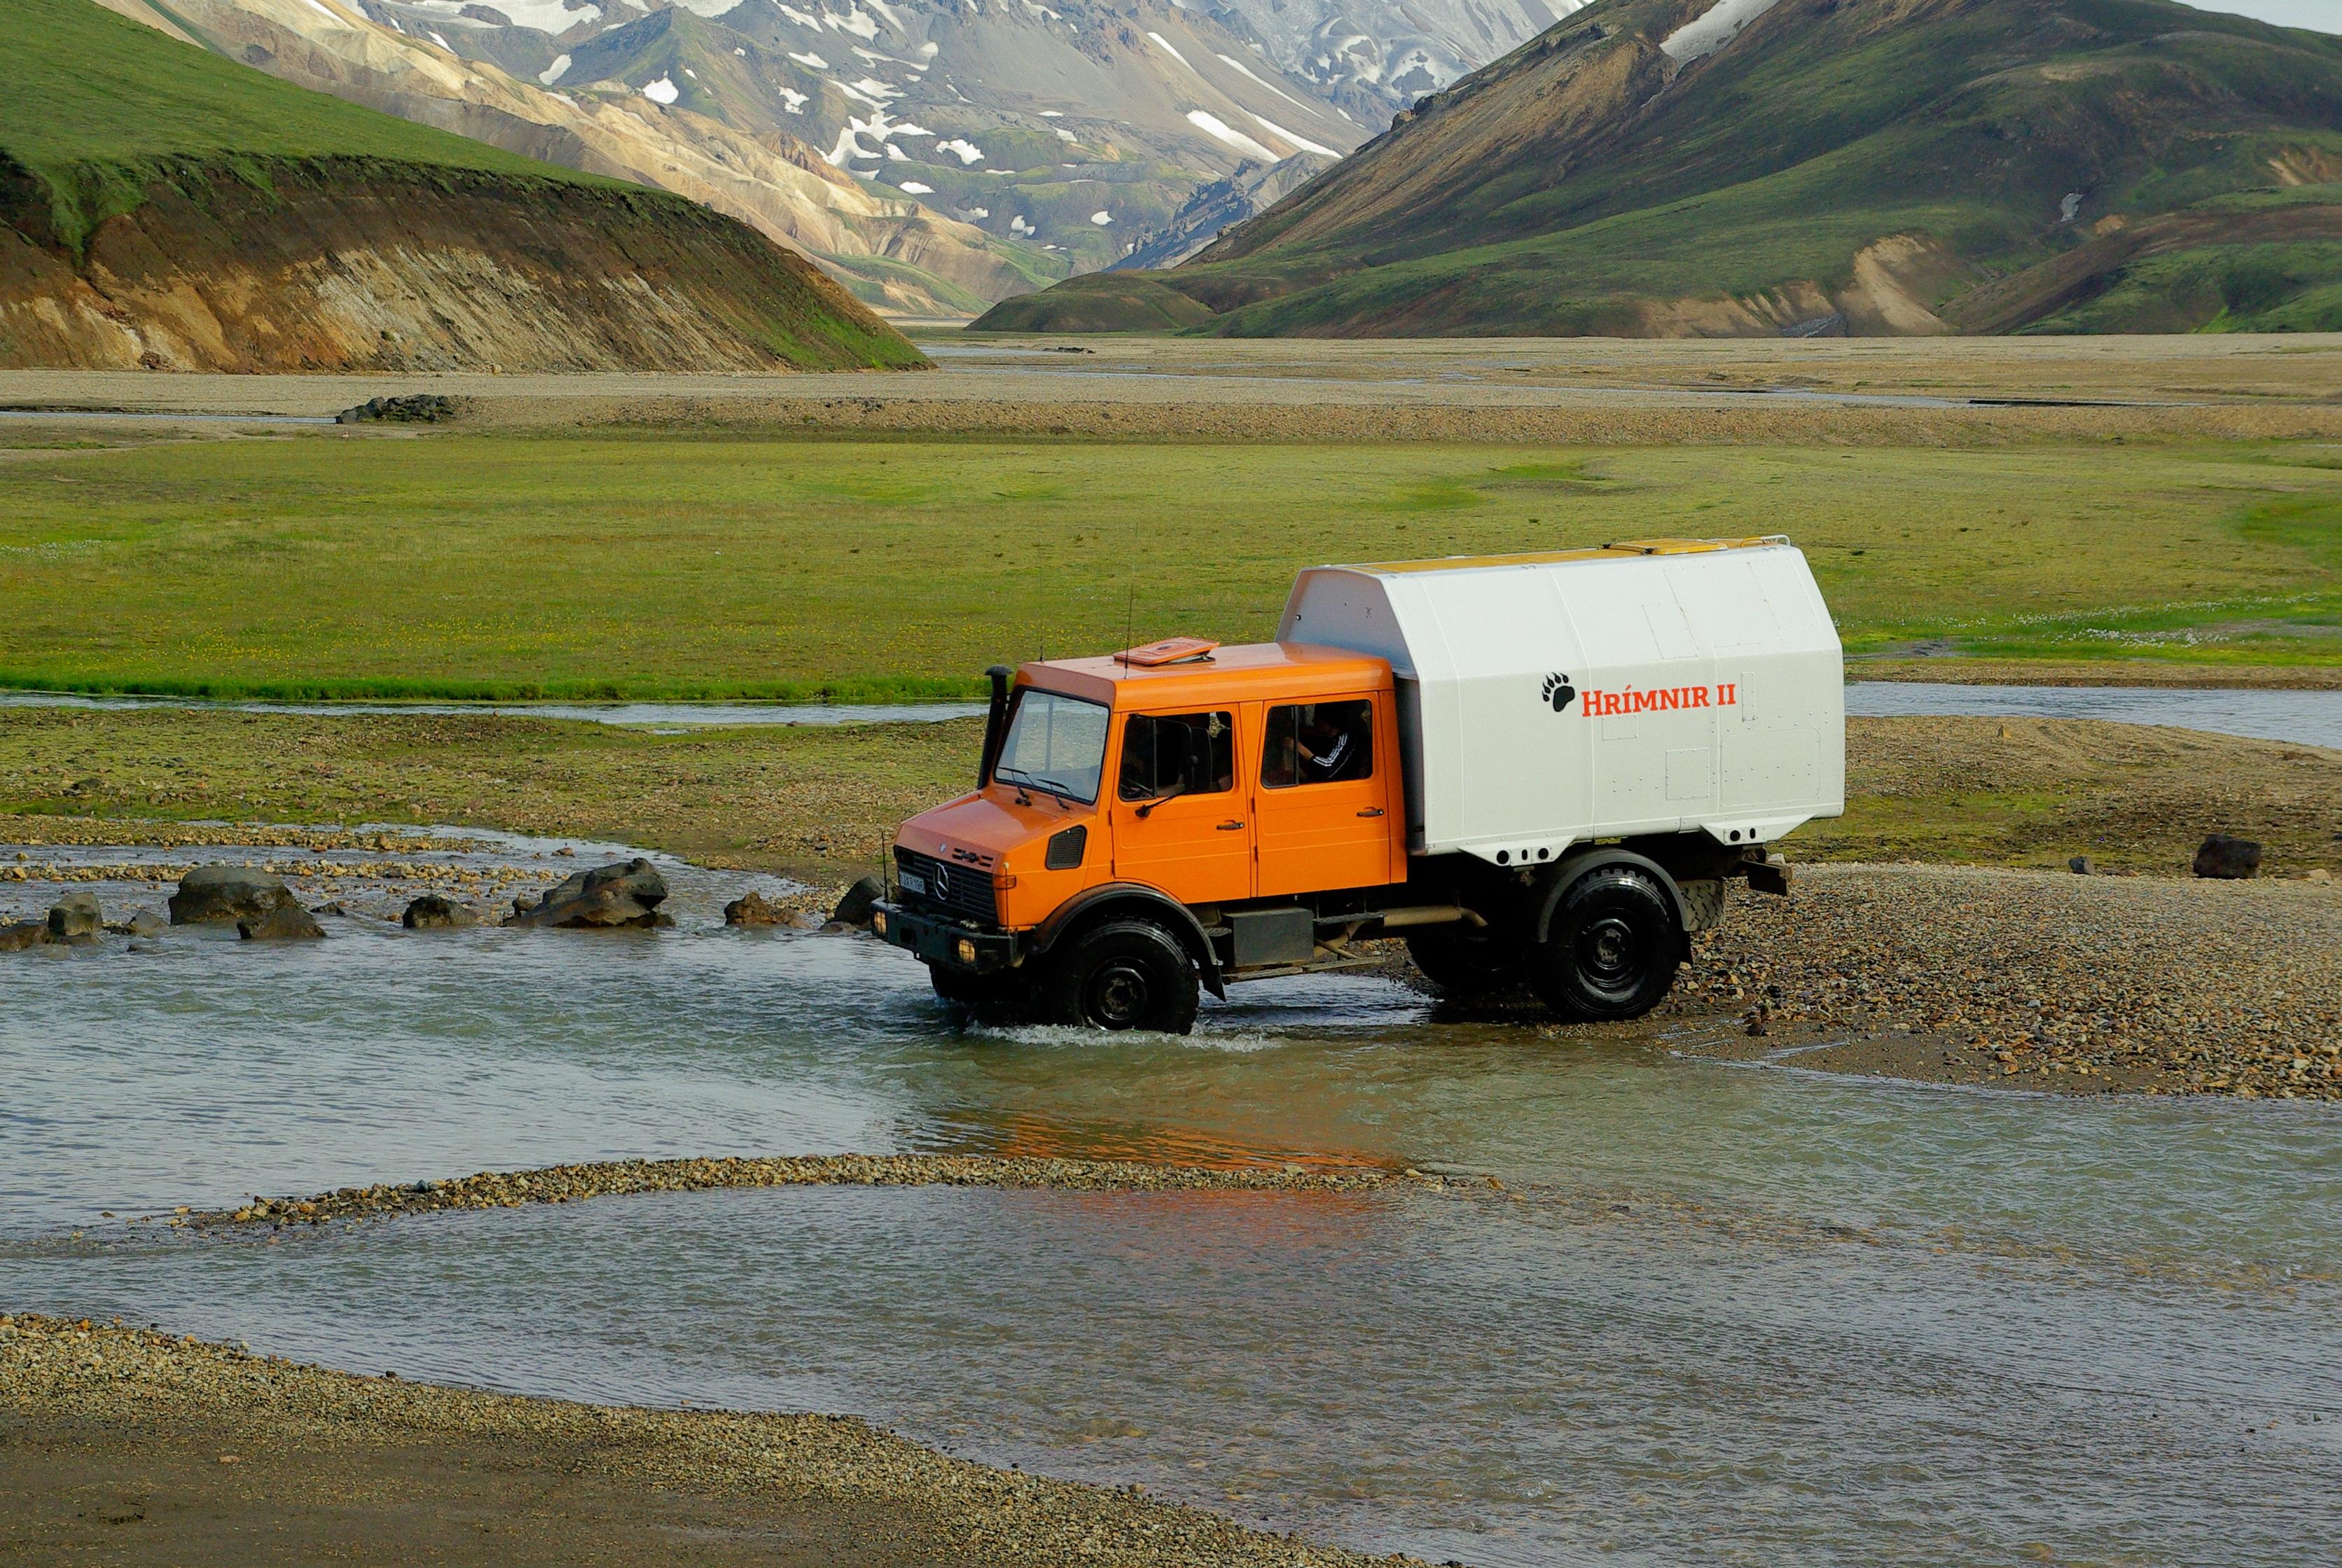 free images field adventure transport truck iceland agriculture torrent rural area all. Black Bedroom Furniture Sets. Home Design Ideas